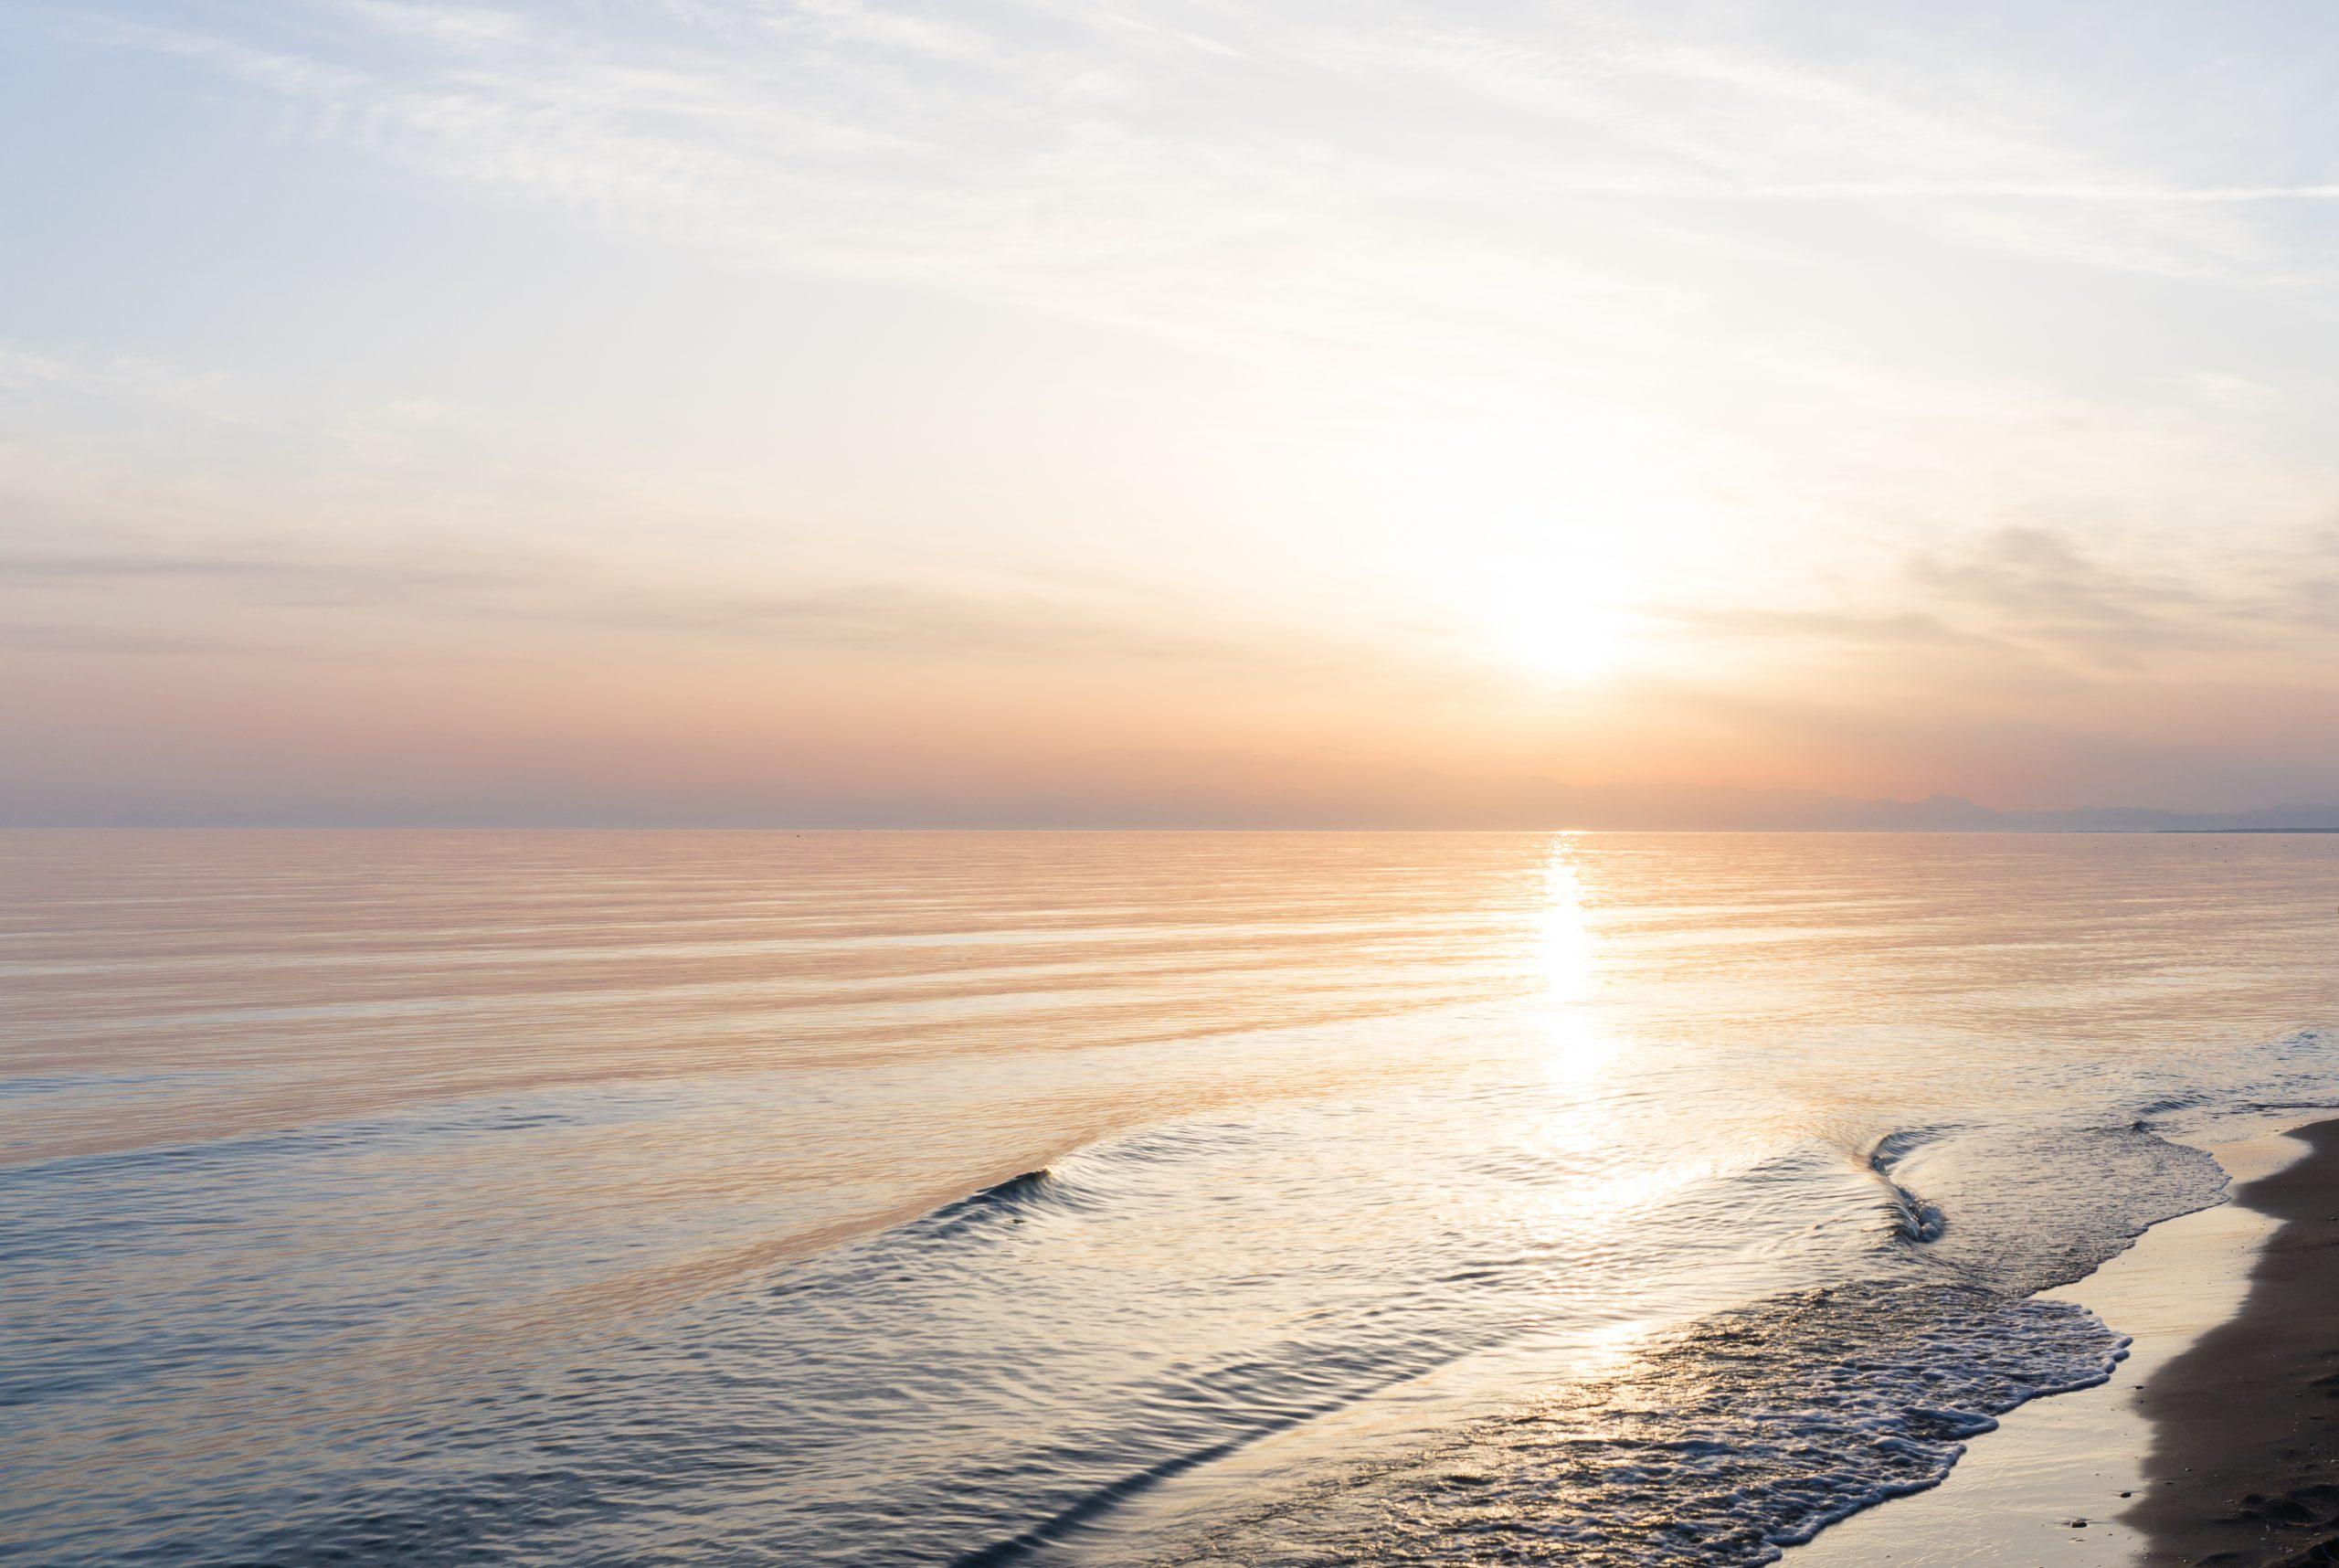 Calming Beach Image